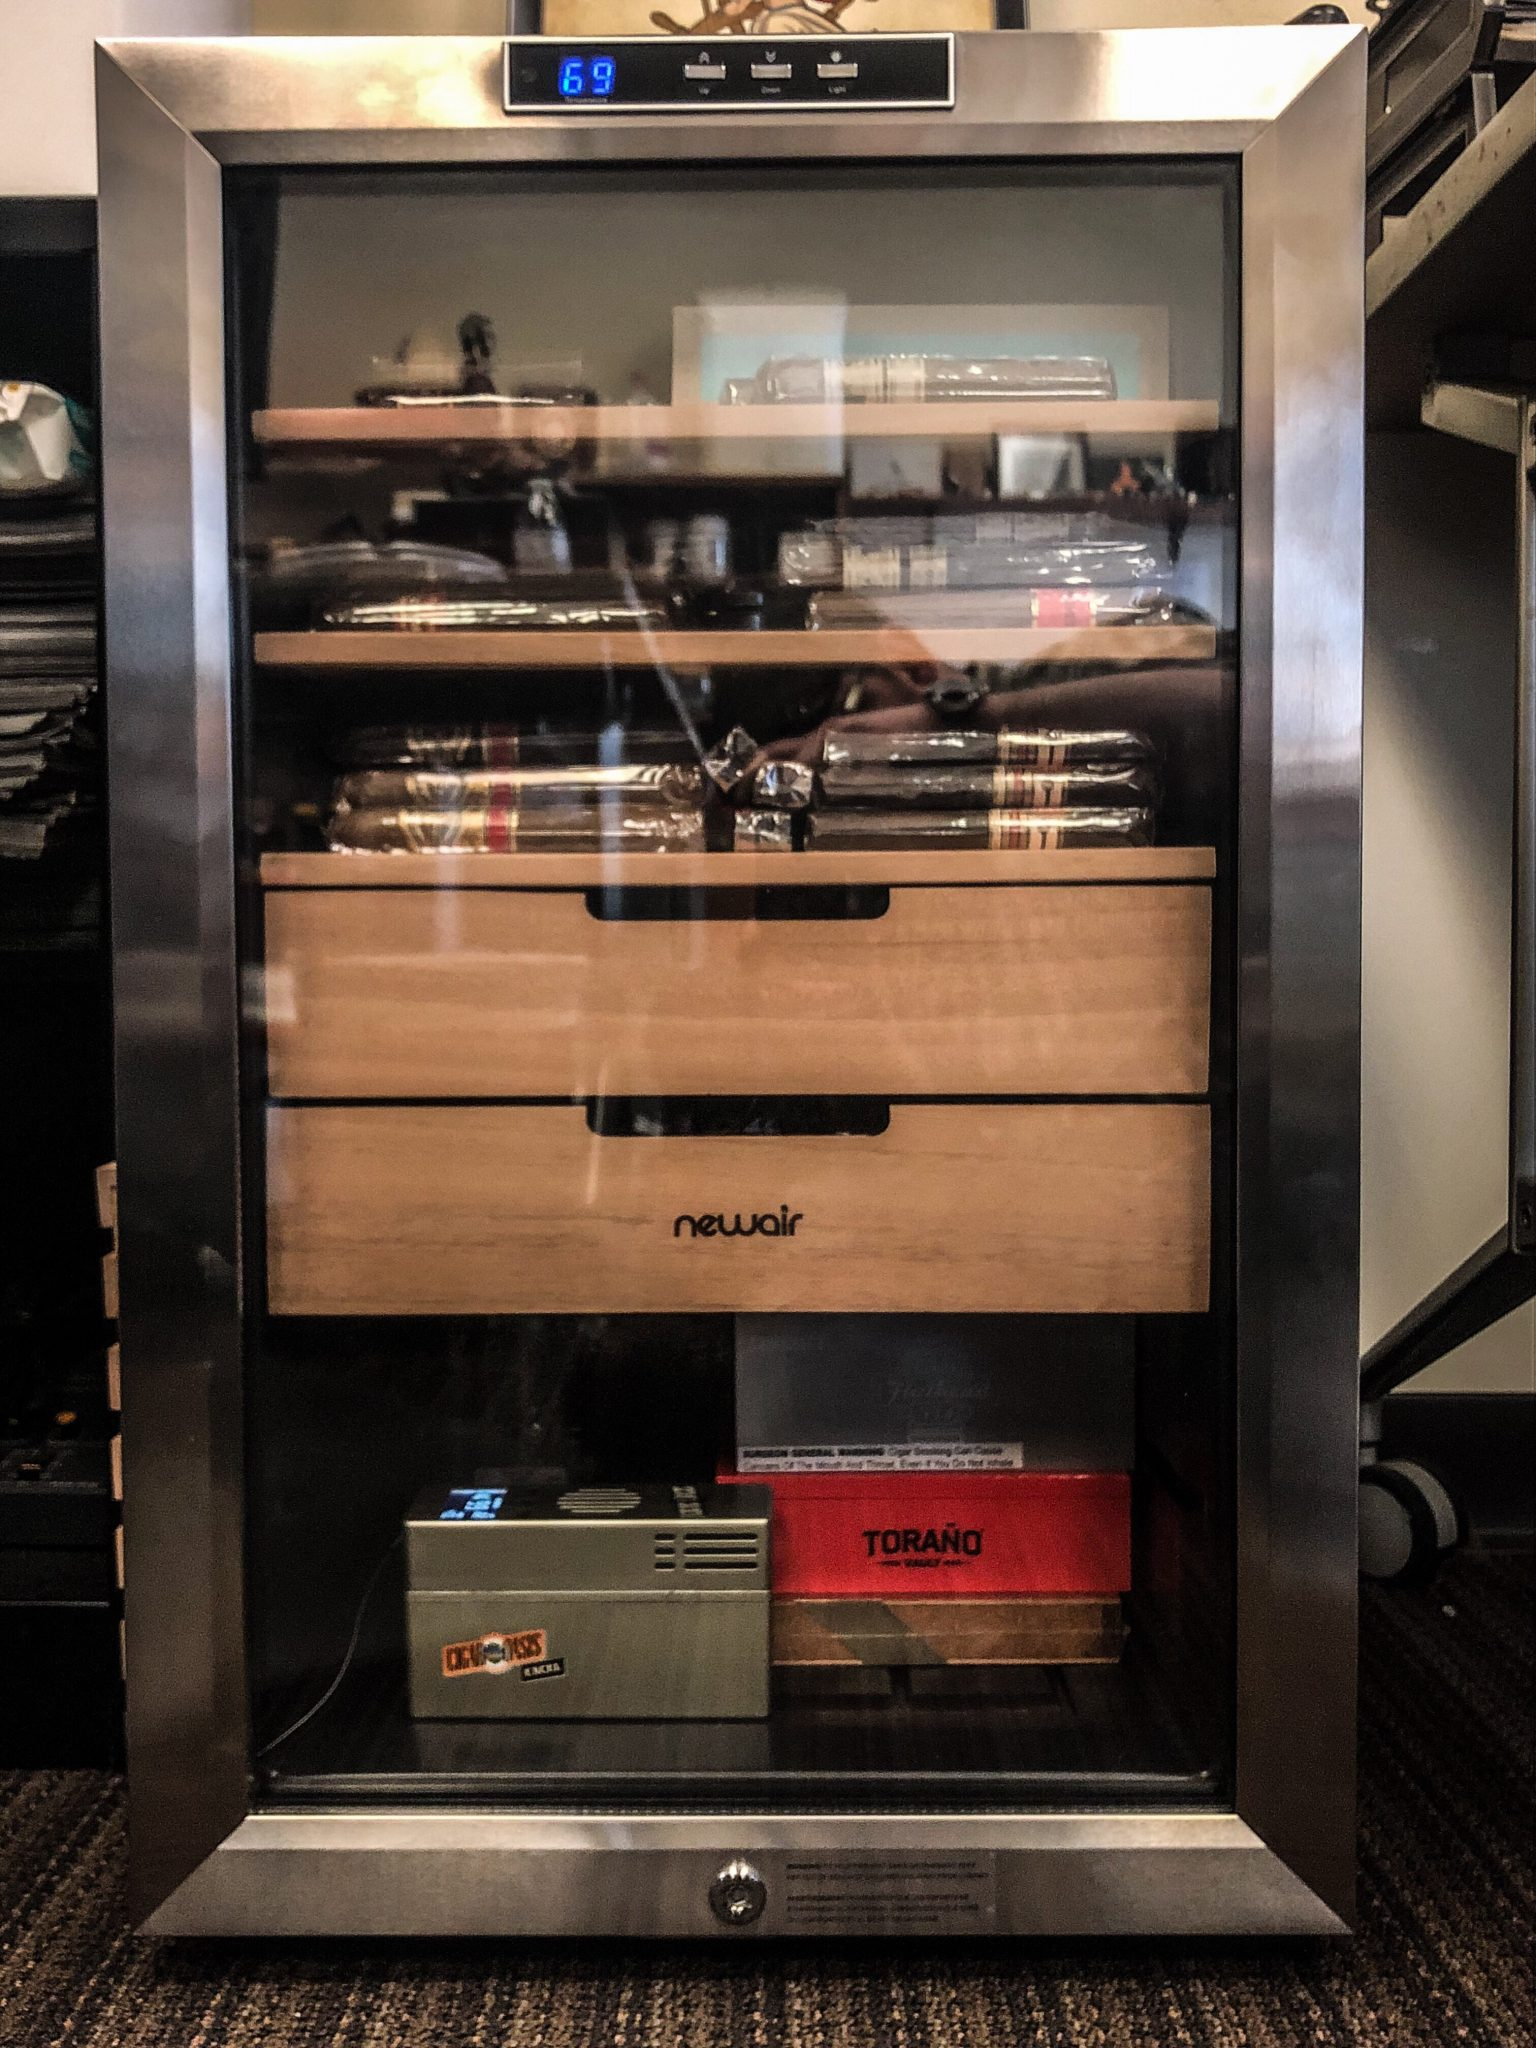 how to use a wineador newair cc-300h wineador review NewAir cigar Wineador at Famous Smoke Shop